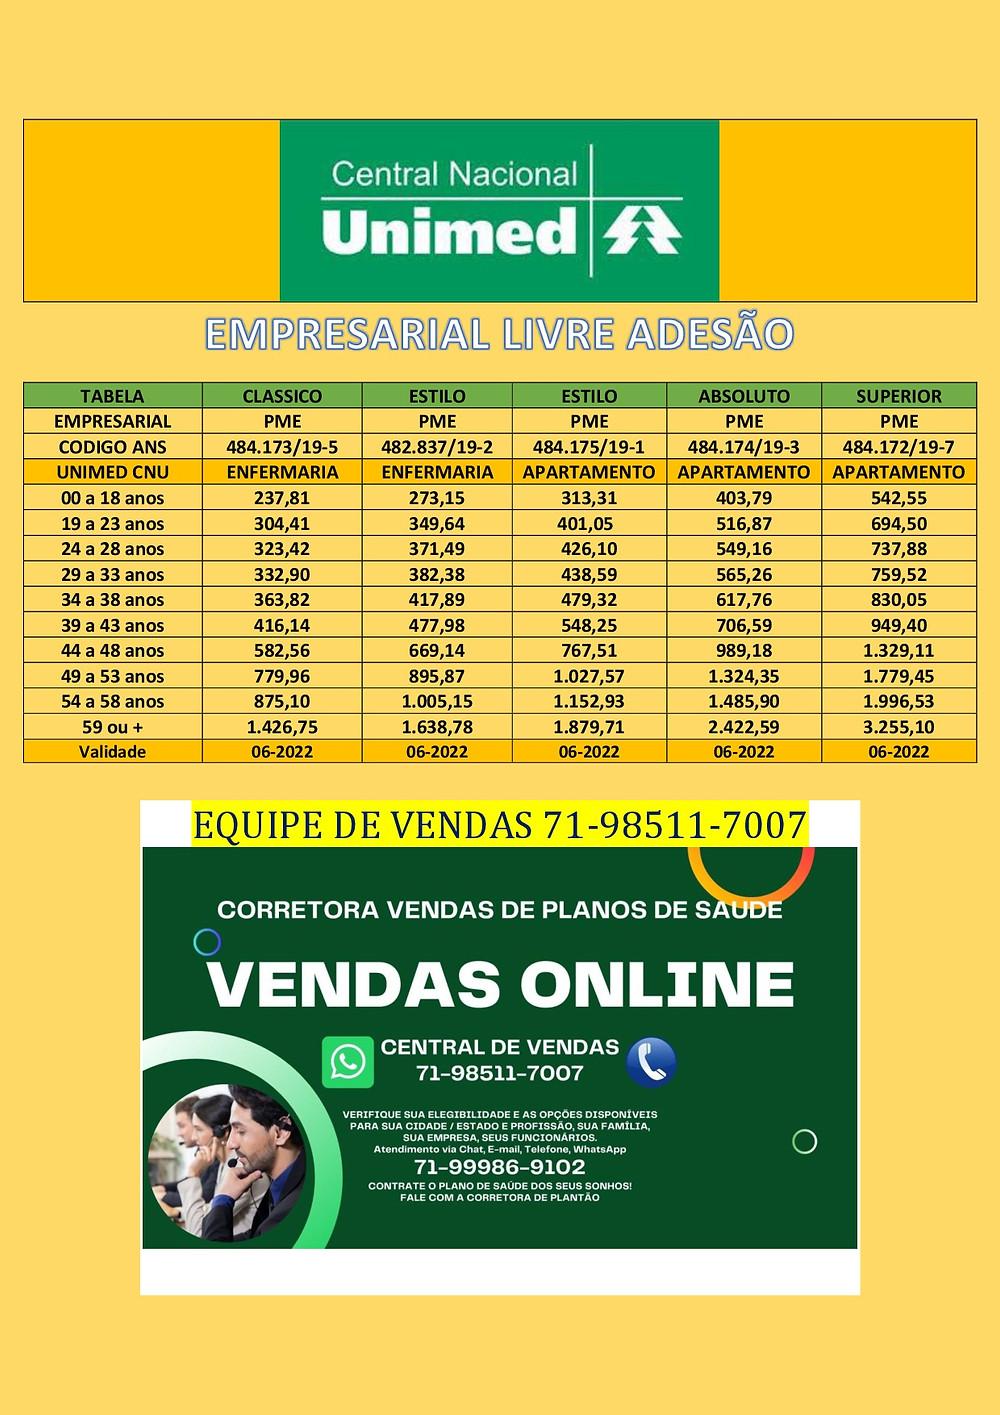 Contrate | Plano Central Nacional Unimed | 0865